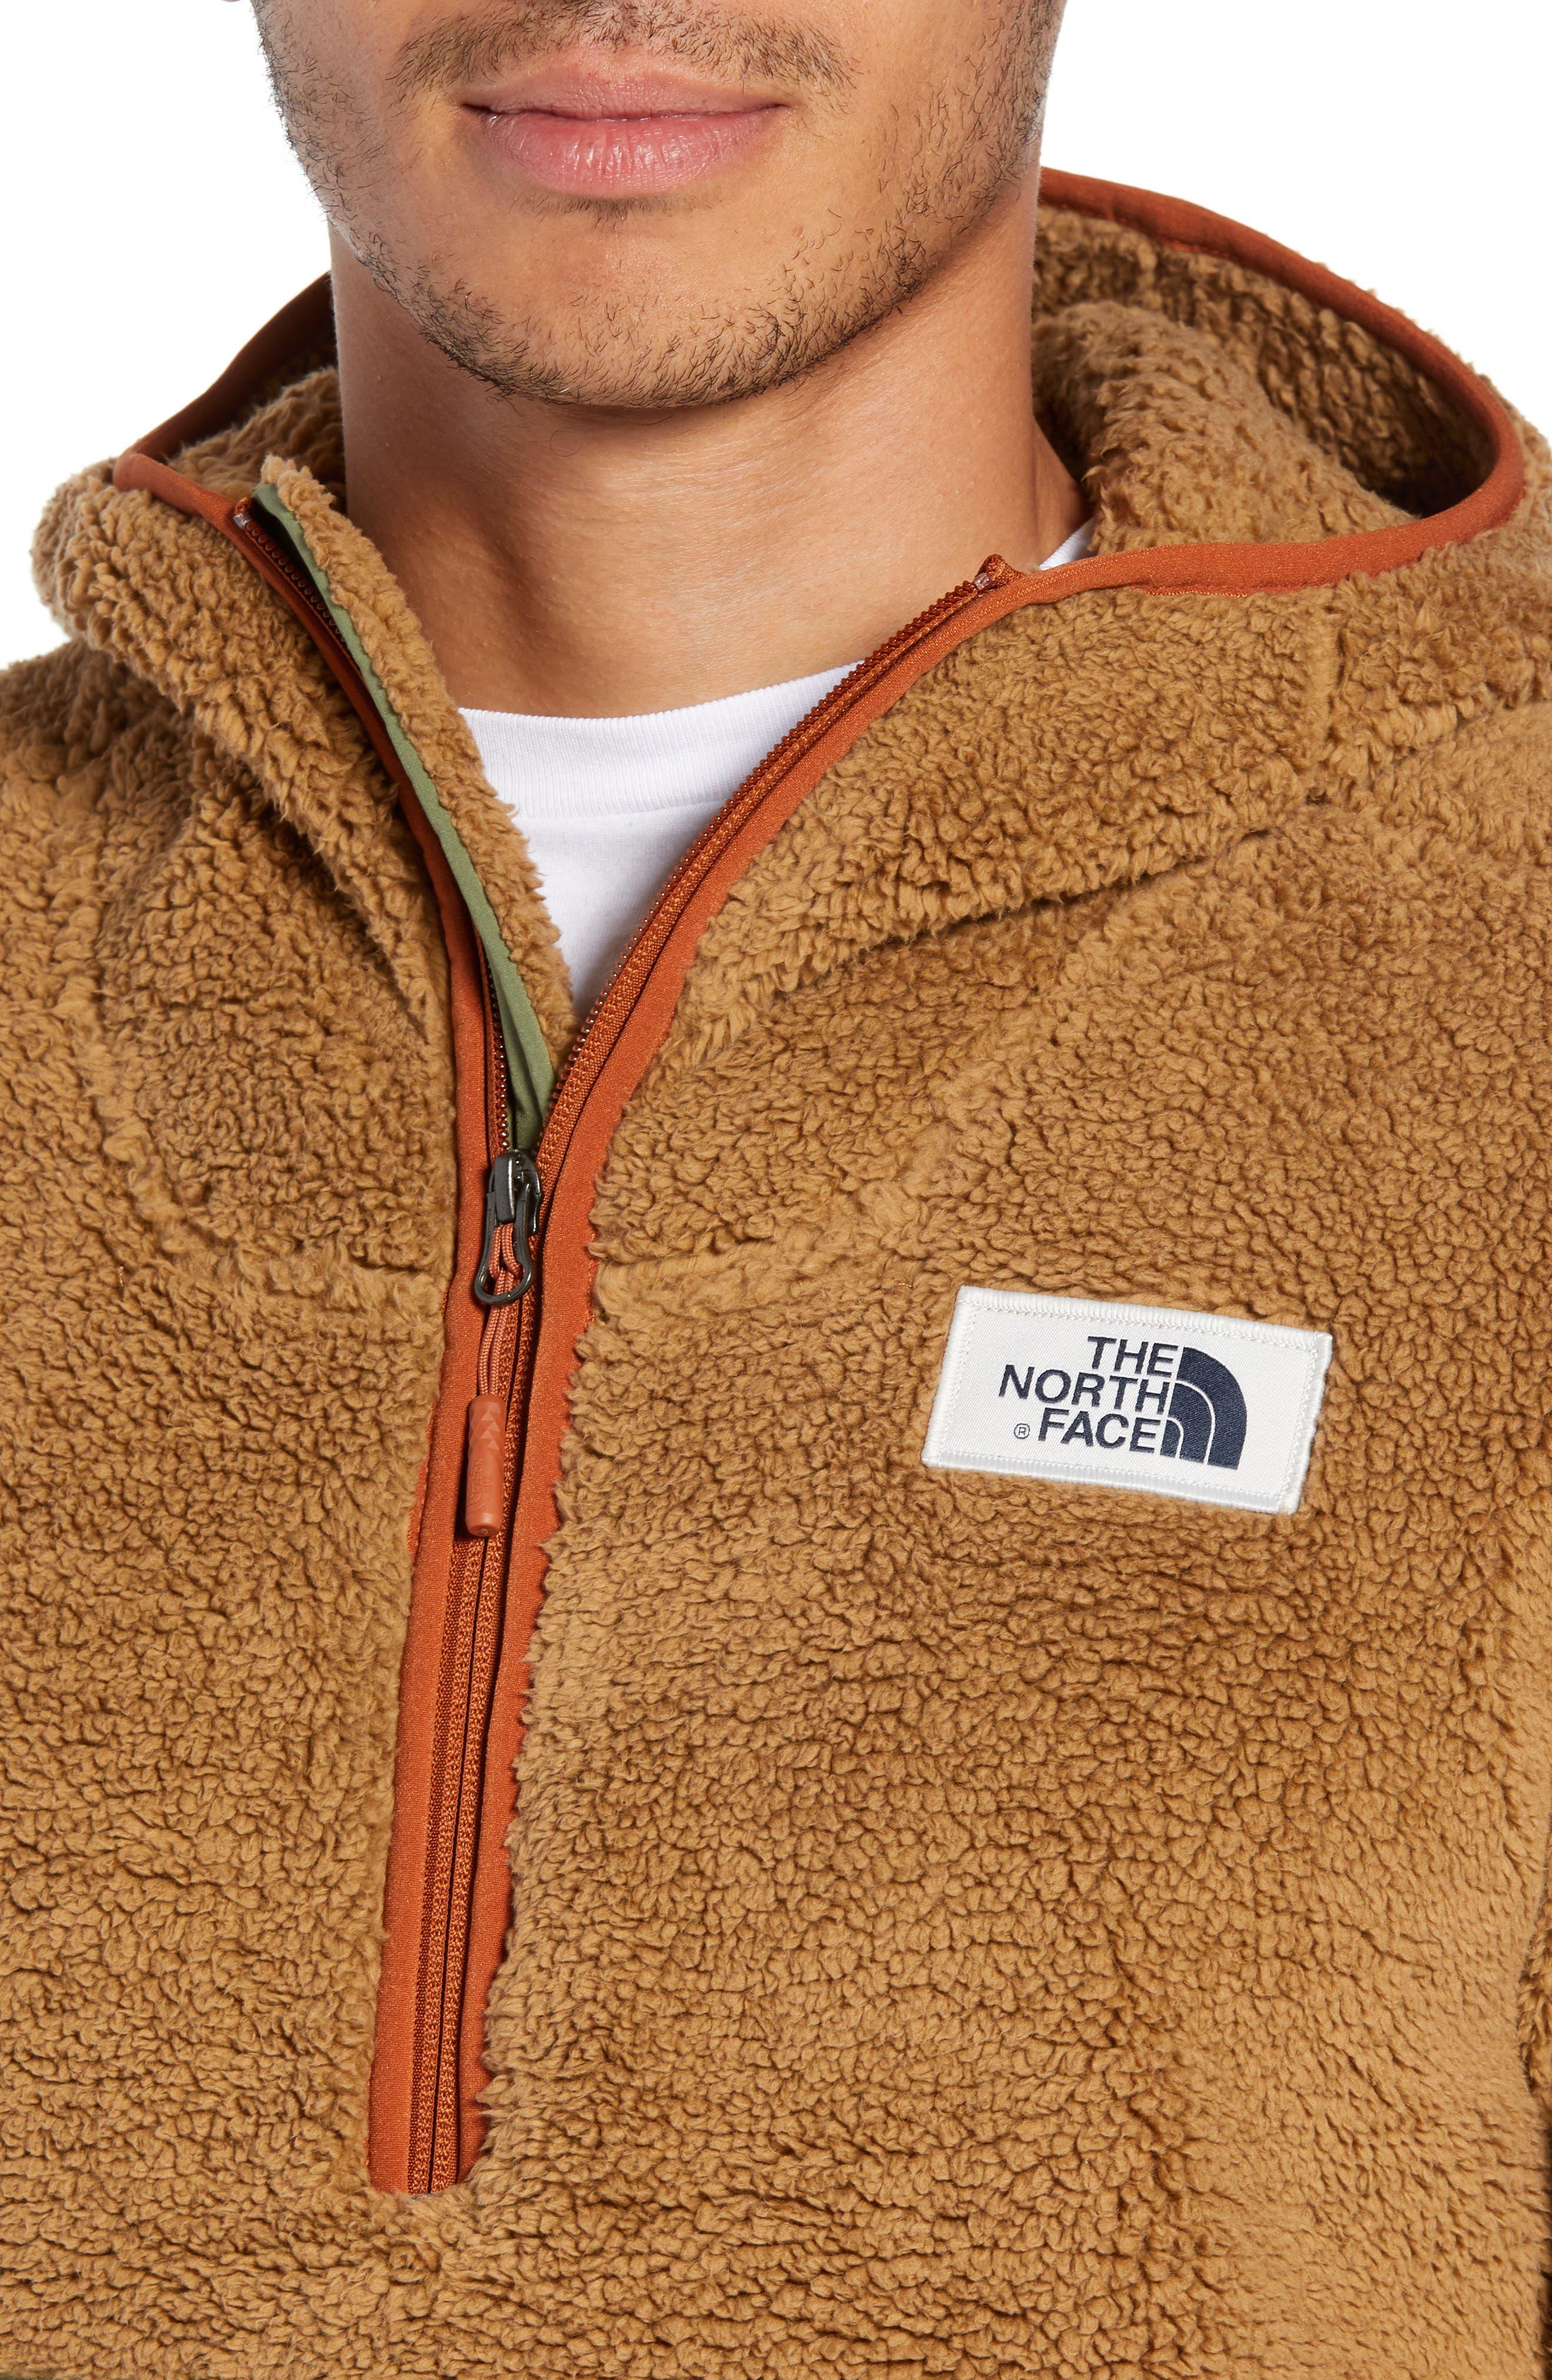 THE NORTH FACE,                             Campshire Anorak Fleece Jacket,                             Alternate thumbnail 4, color,                             CARGO KHAKI/ FOUR LEAF CLOVER